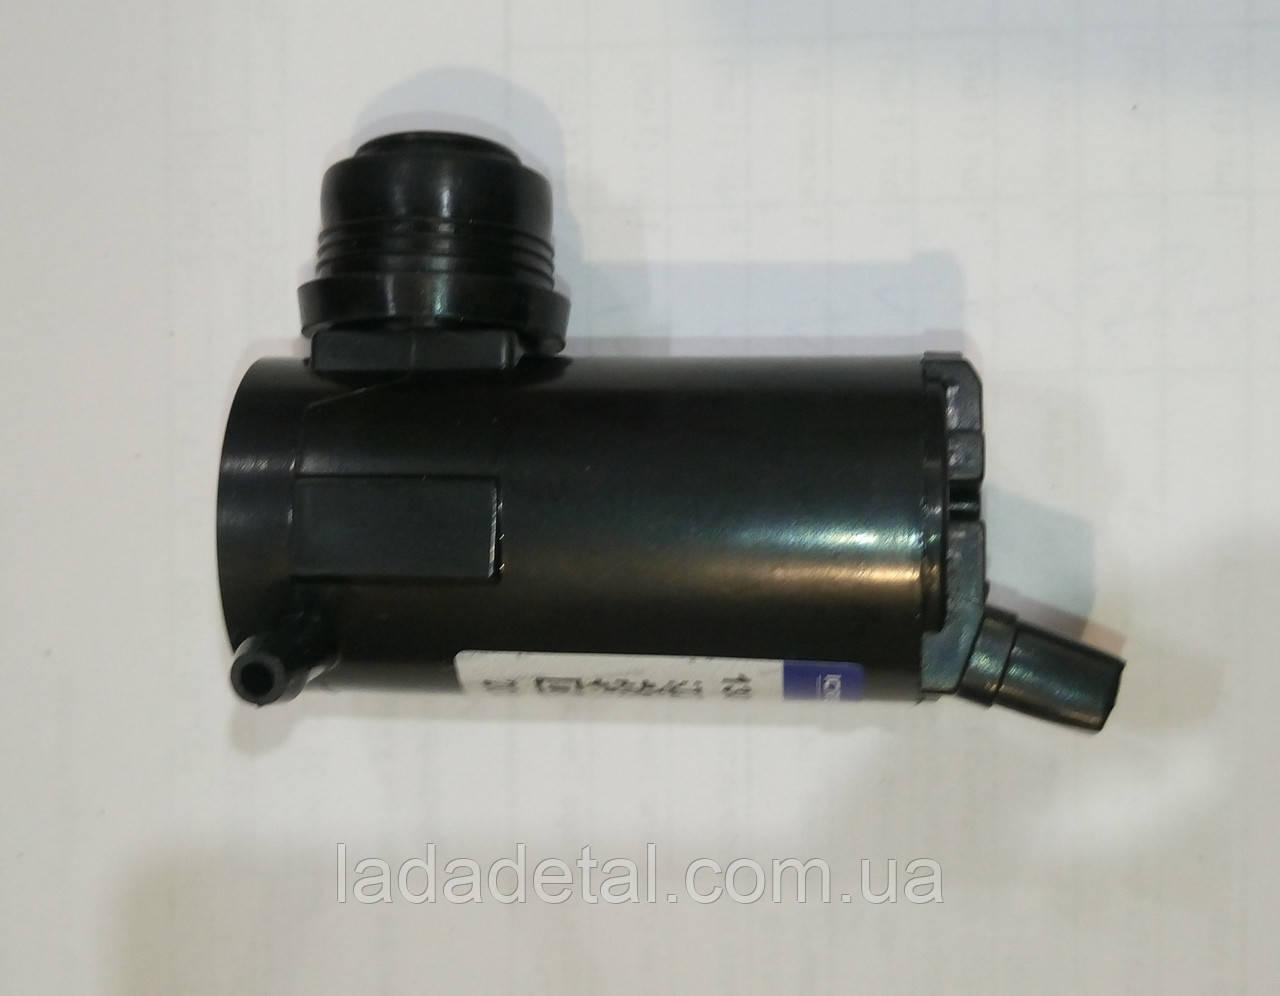 Мотор (насос) омывателя Ланос, Нексия, Сенс CRB